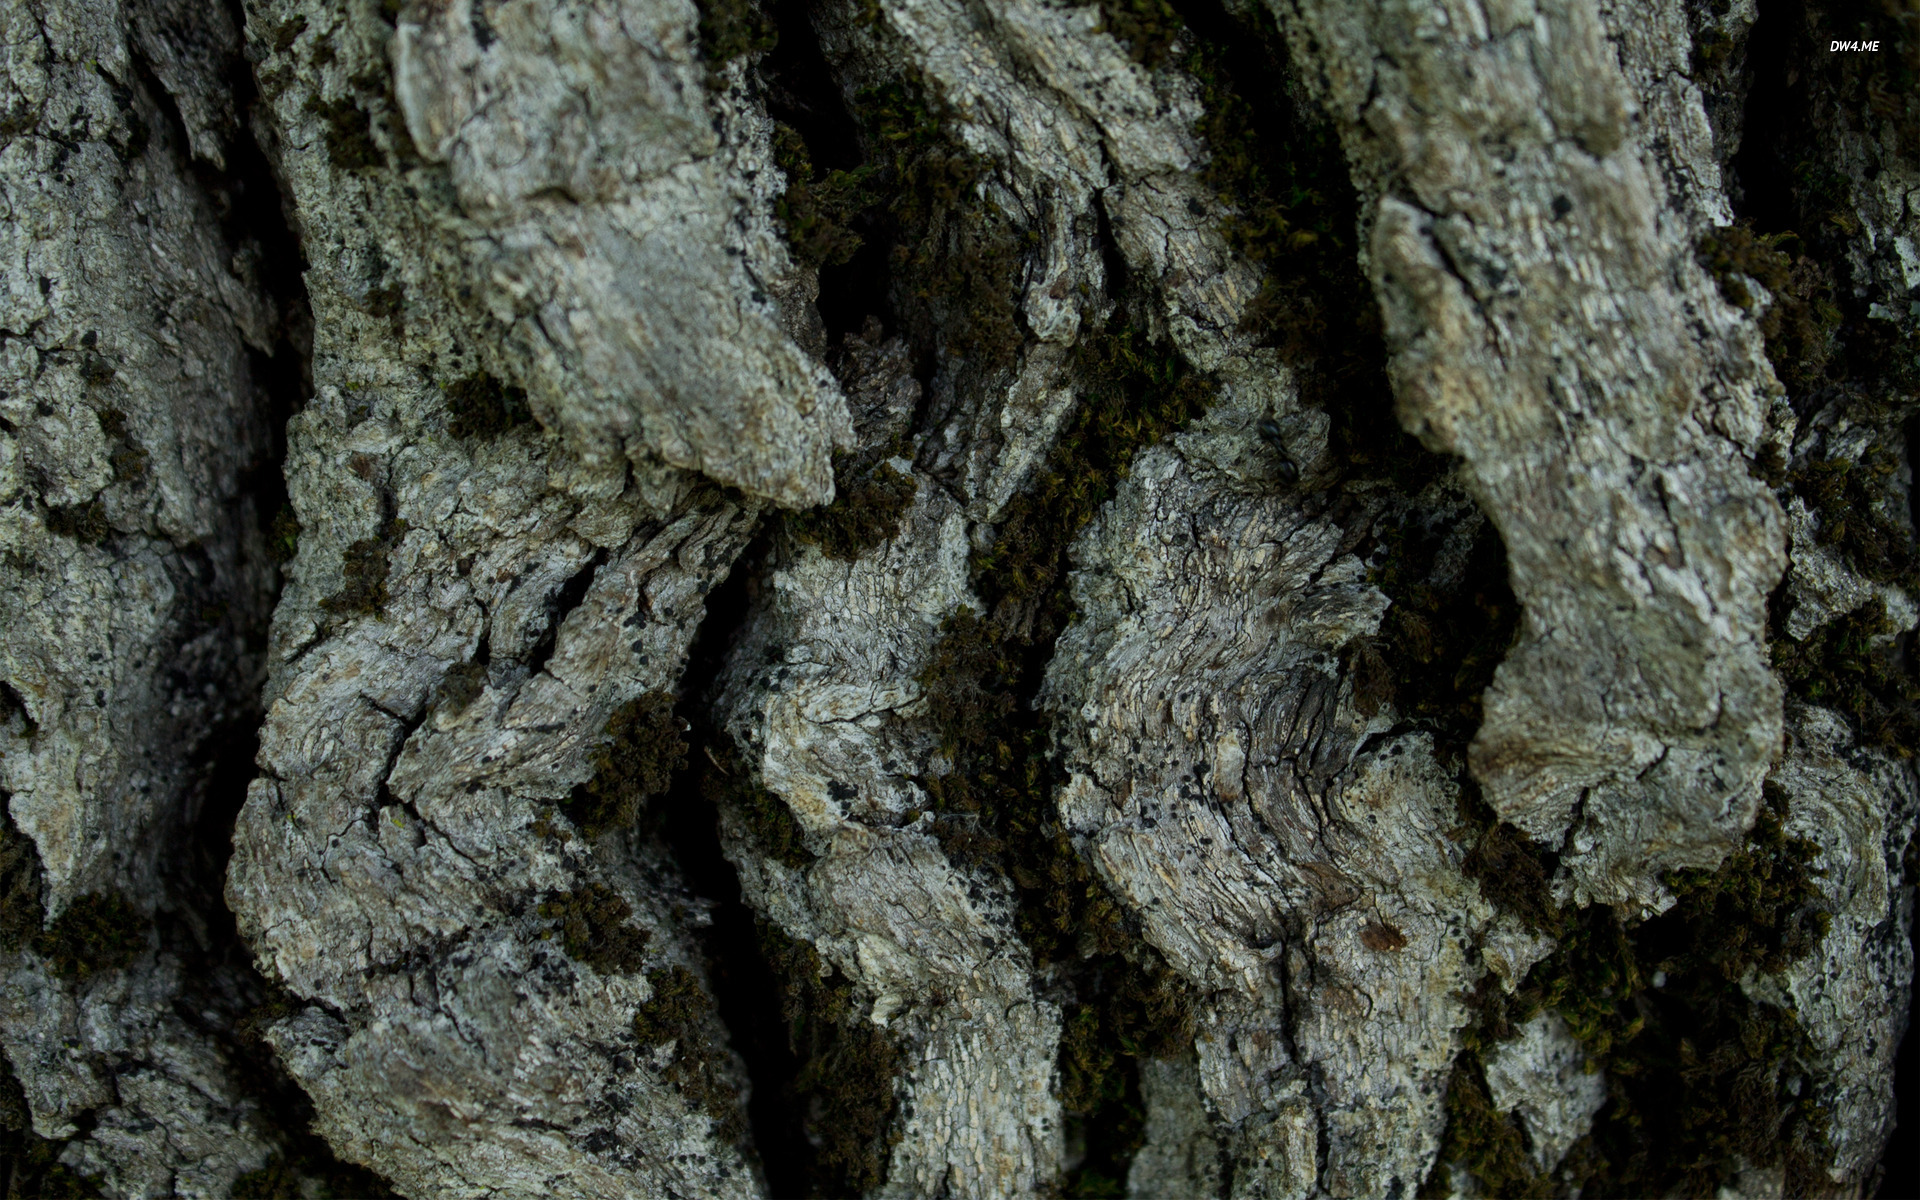 Tree bark wallpaper   Photography wallpapers   377 1920x1200